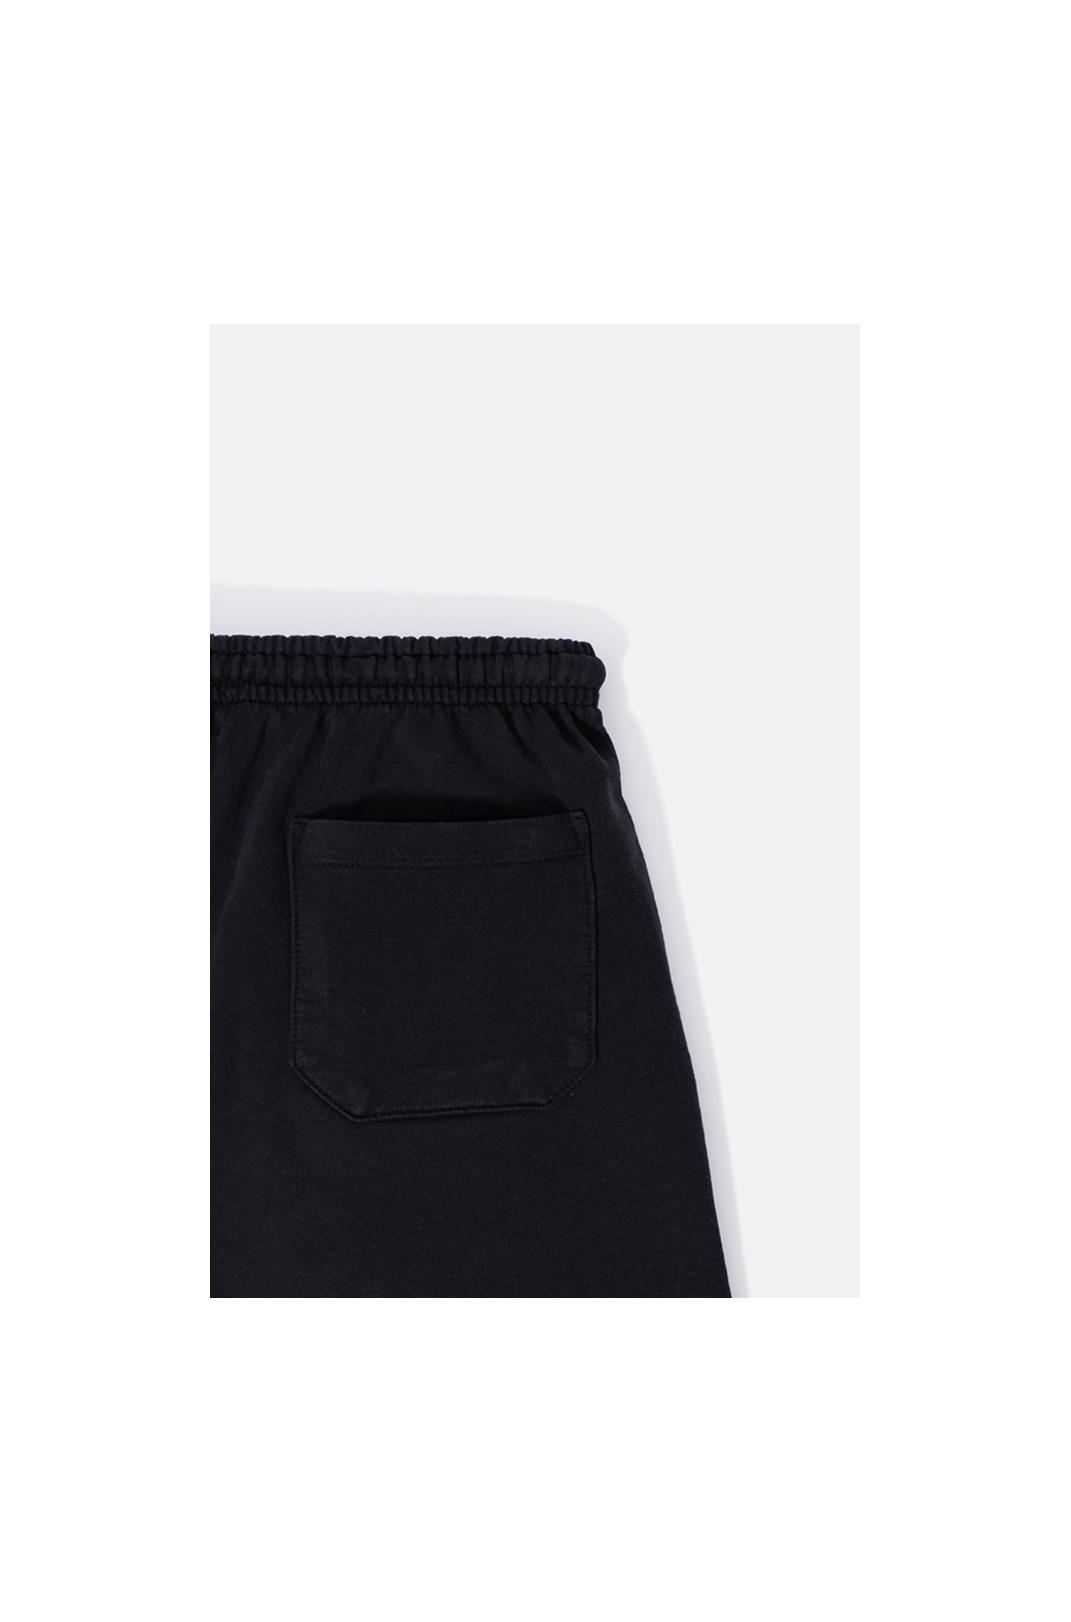 Shorts Moletom Approve Monochromatic Preto